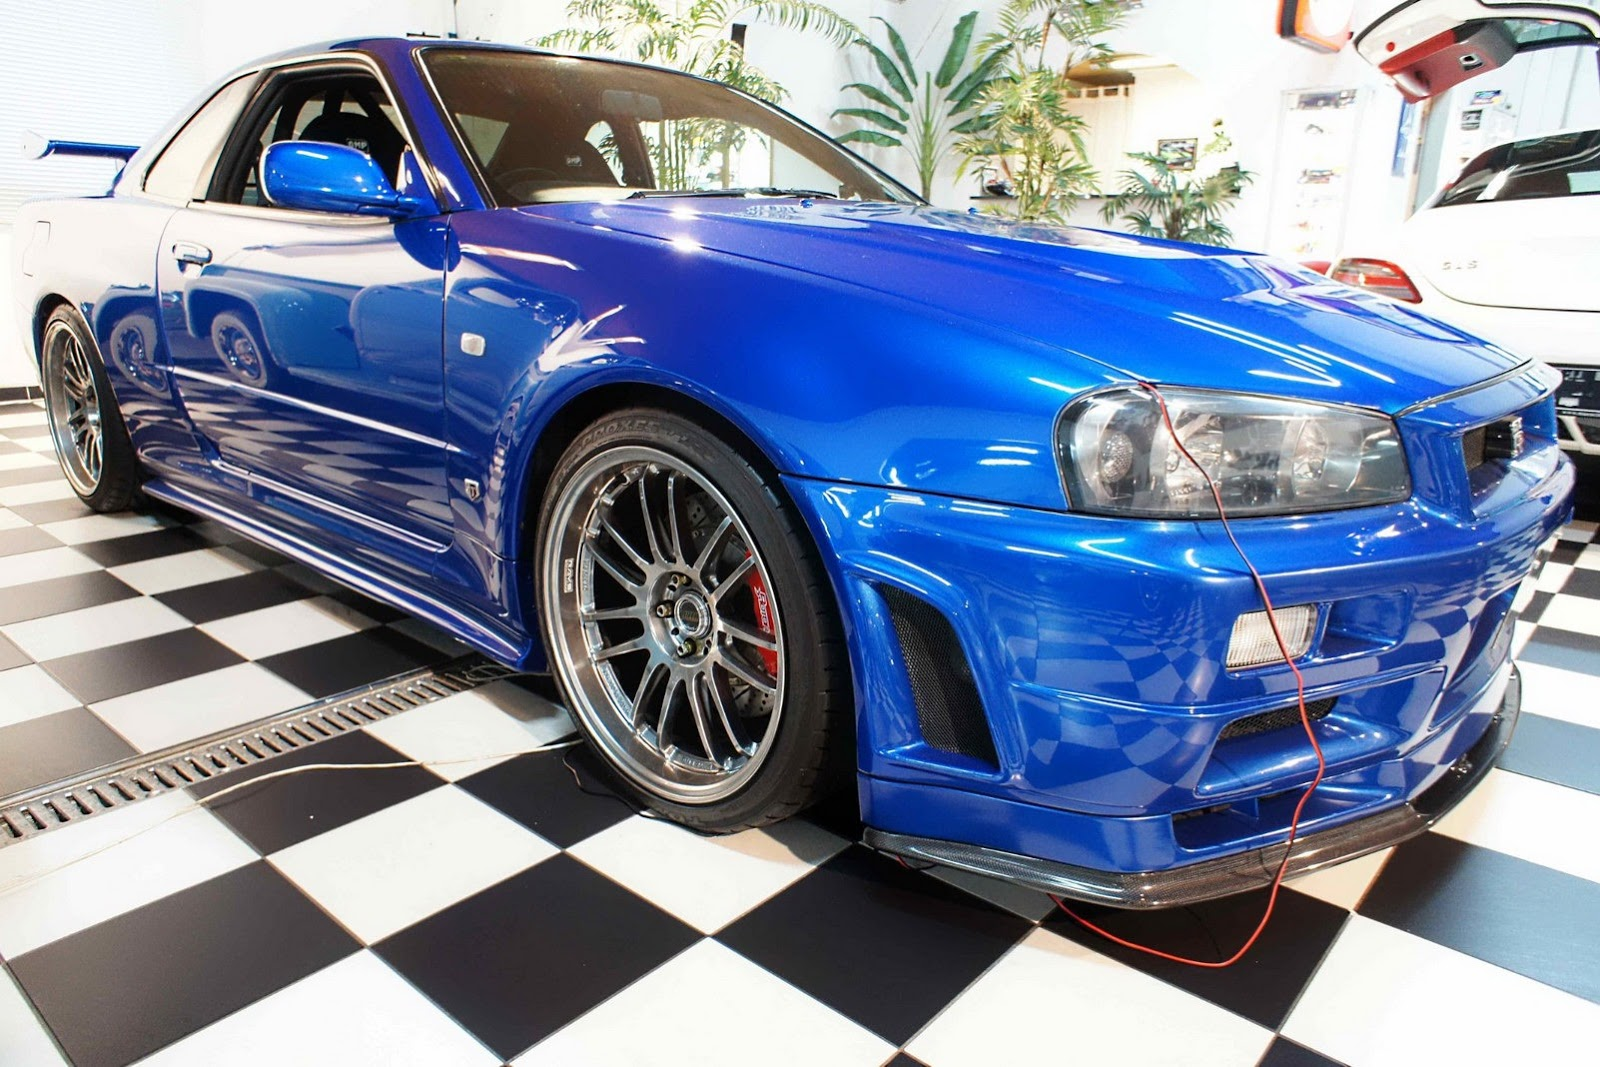 Fast And Furious 6 Cars Wallpapers Hd Se Vende El Nissan Skyline Gt R De Paul Walker Que Rod 243 En